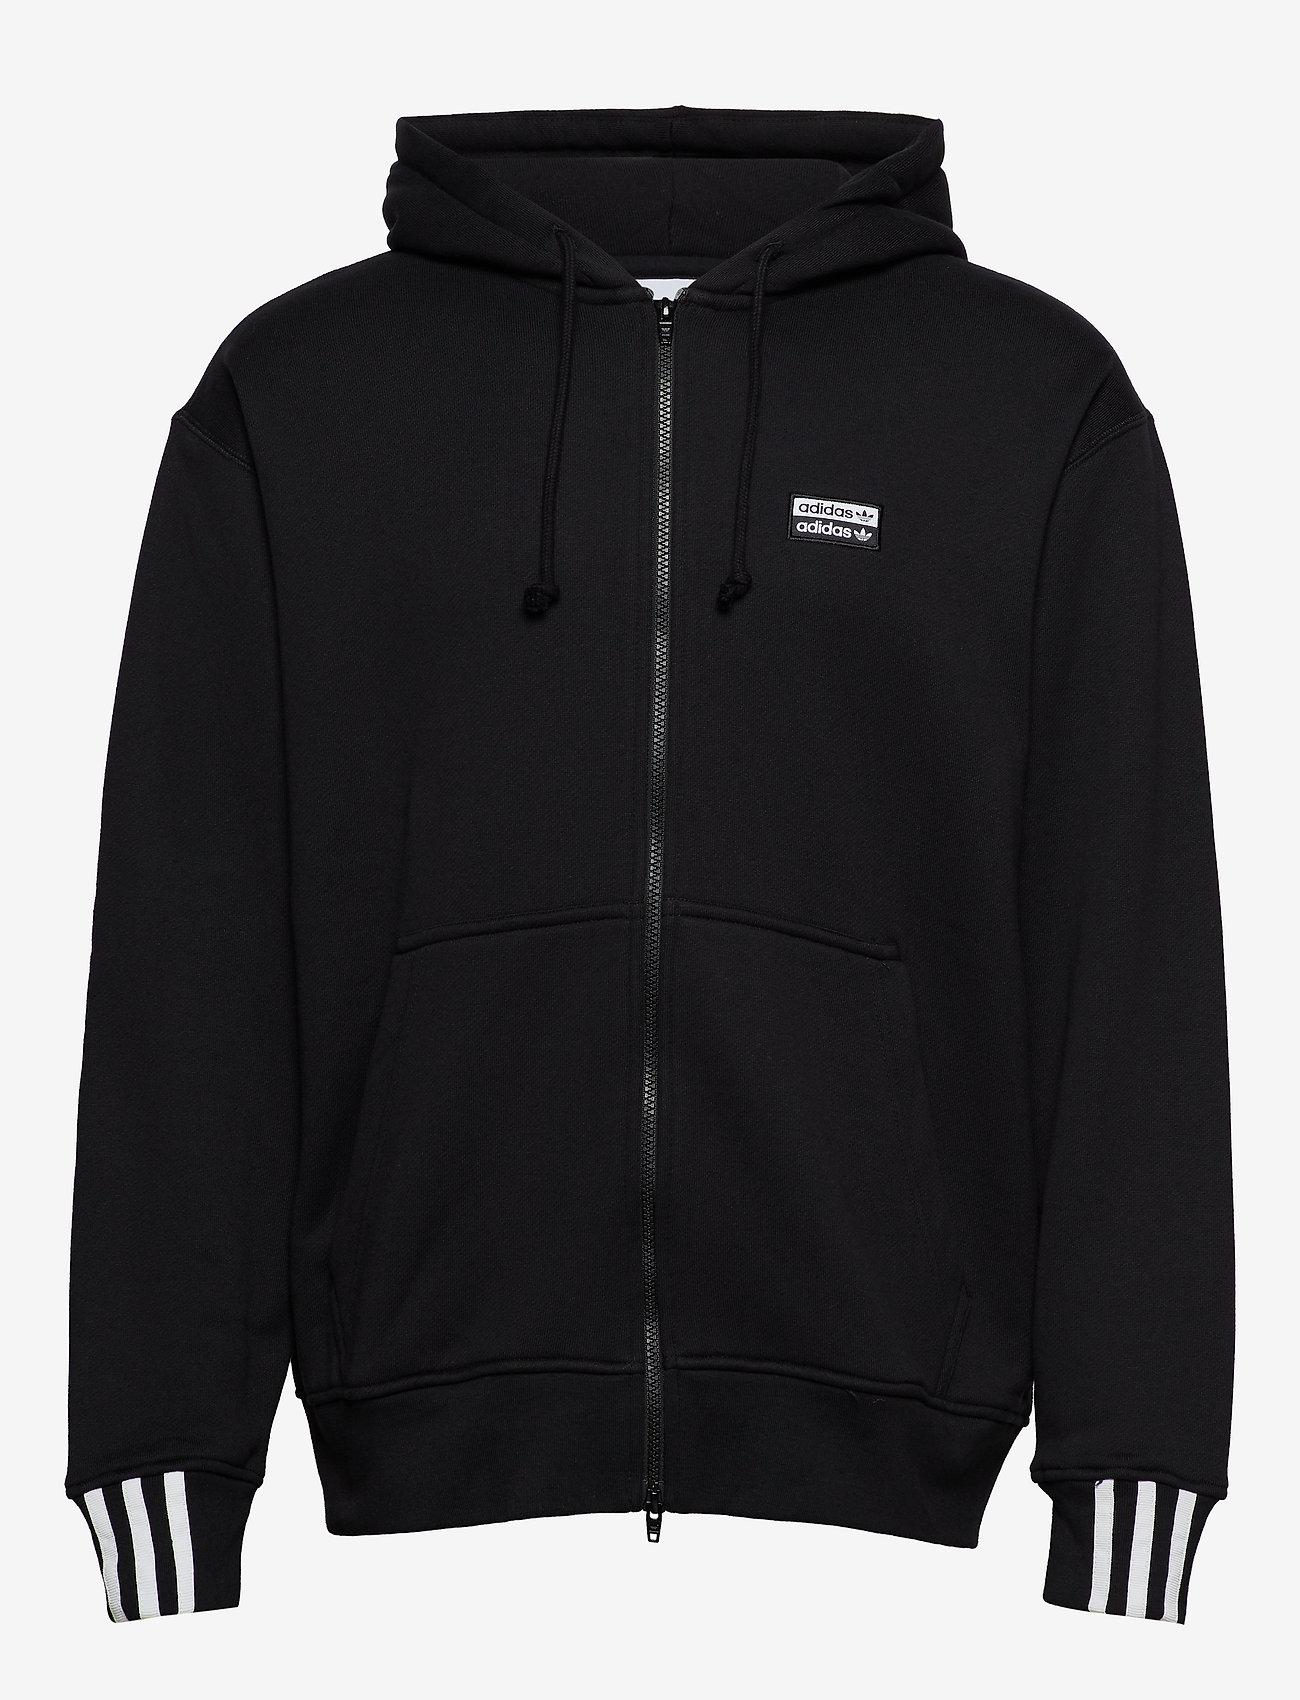 Vocal Fz Hoody (Black) - adidas Originals C0Mqmx